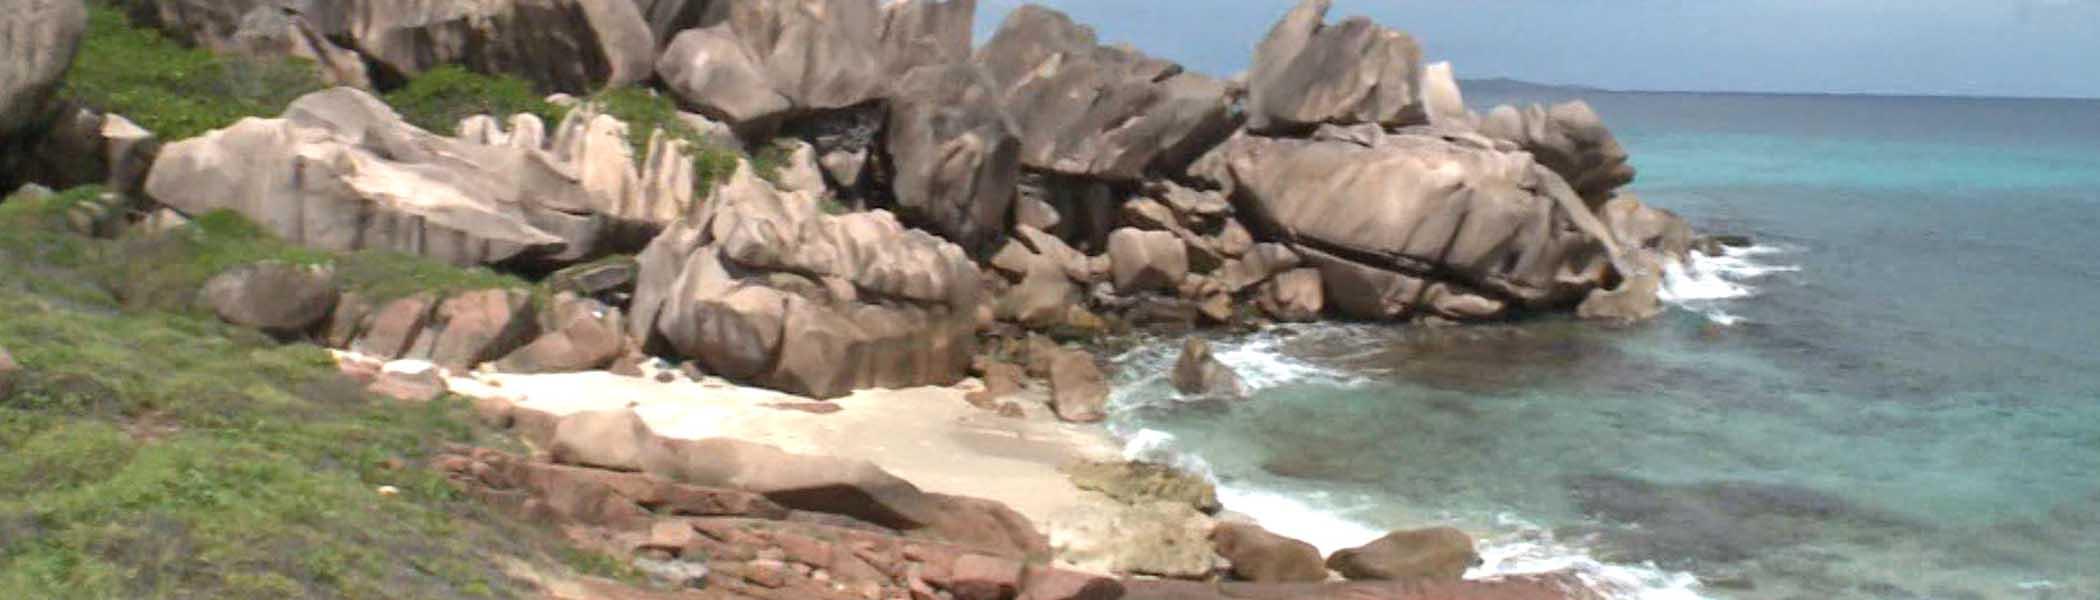 anse-songe, Beaches in Seychelles Islands